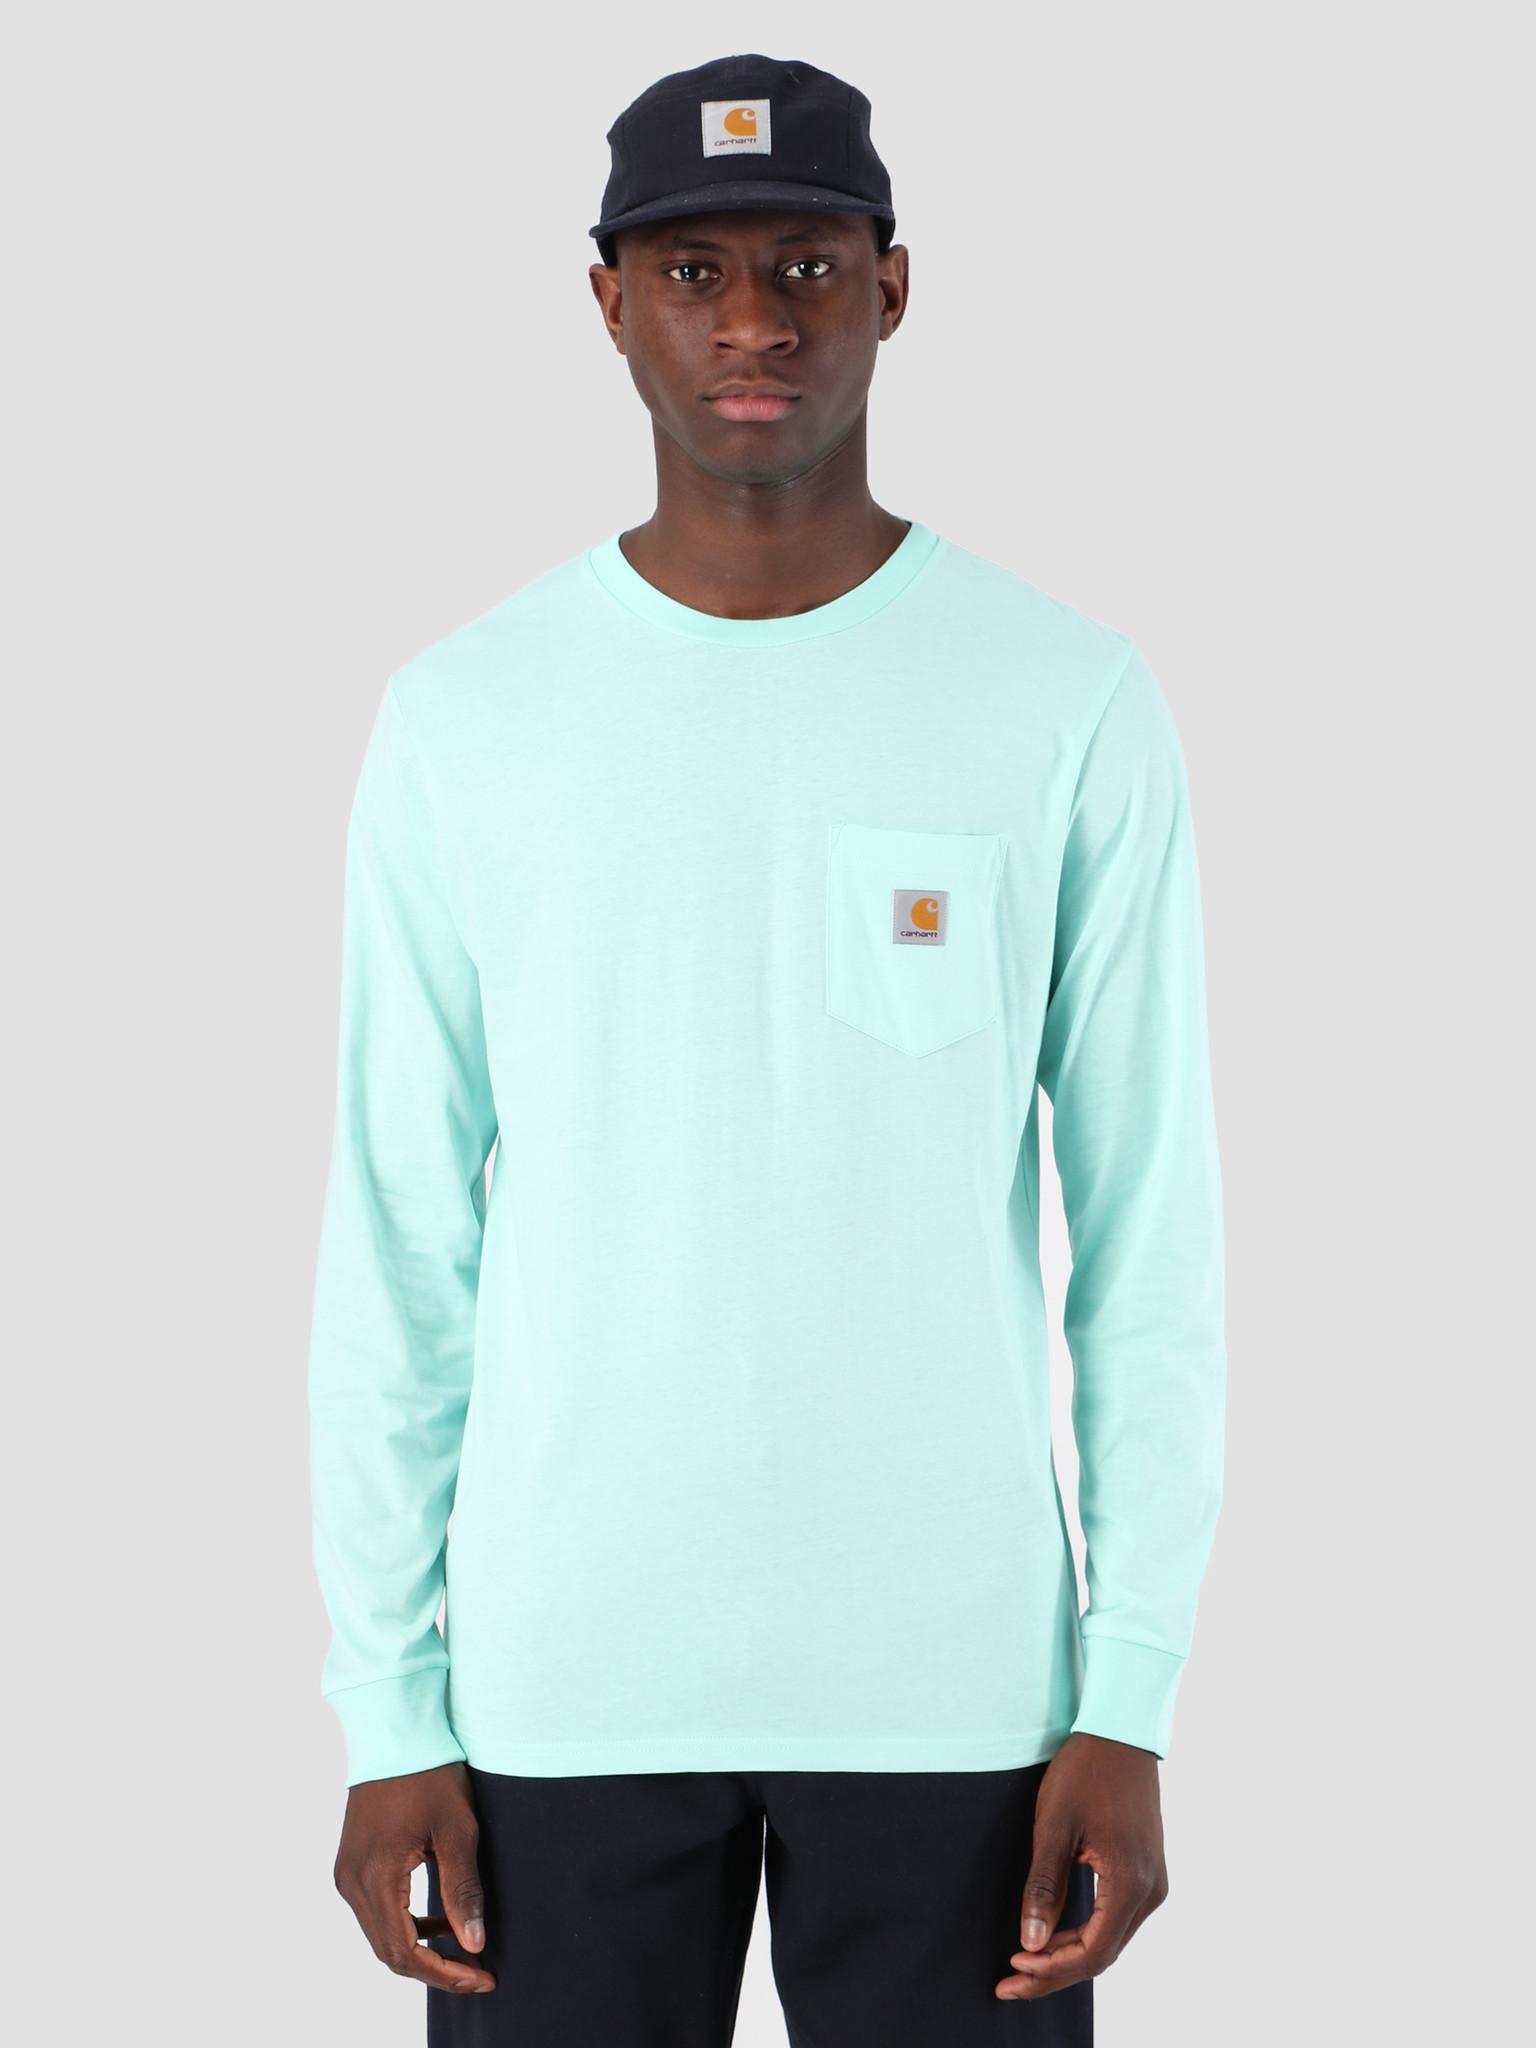 Carhartt WIP Carhartt WIP Long Sleeve Pocket T-Shirt Light Yucca 61091000